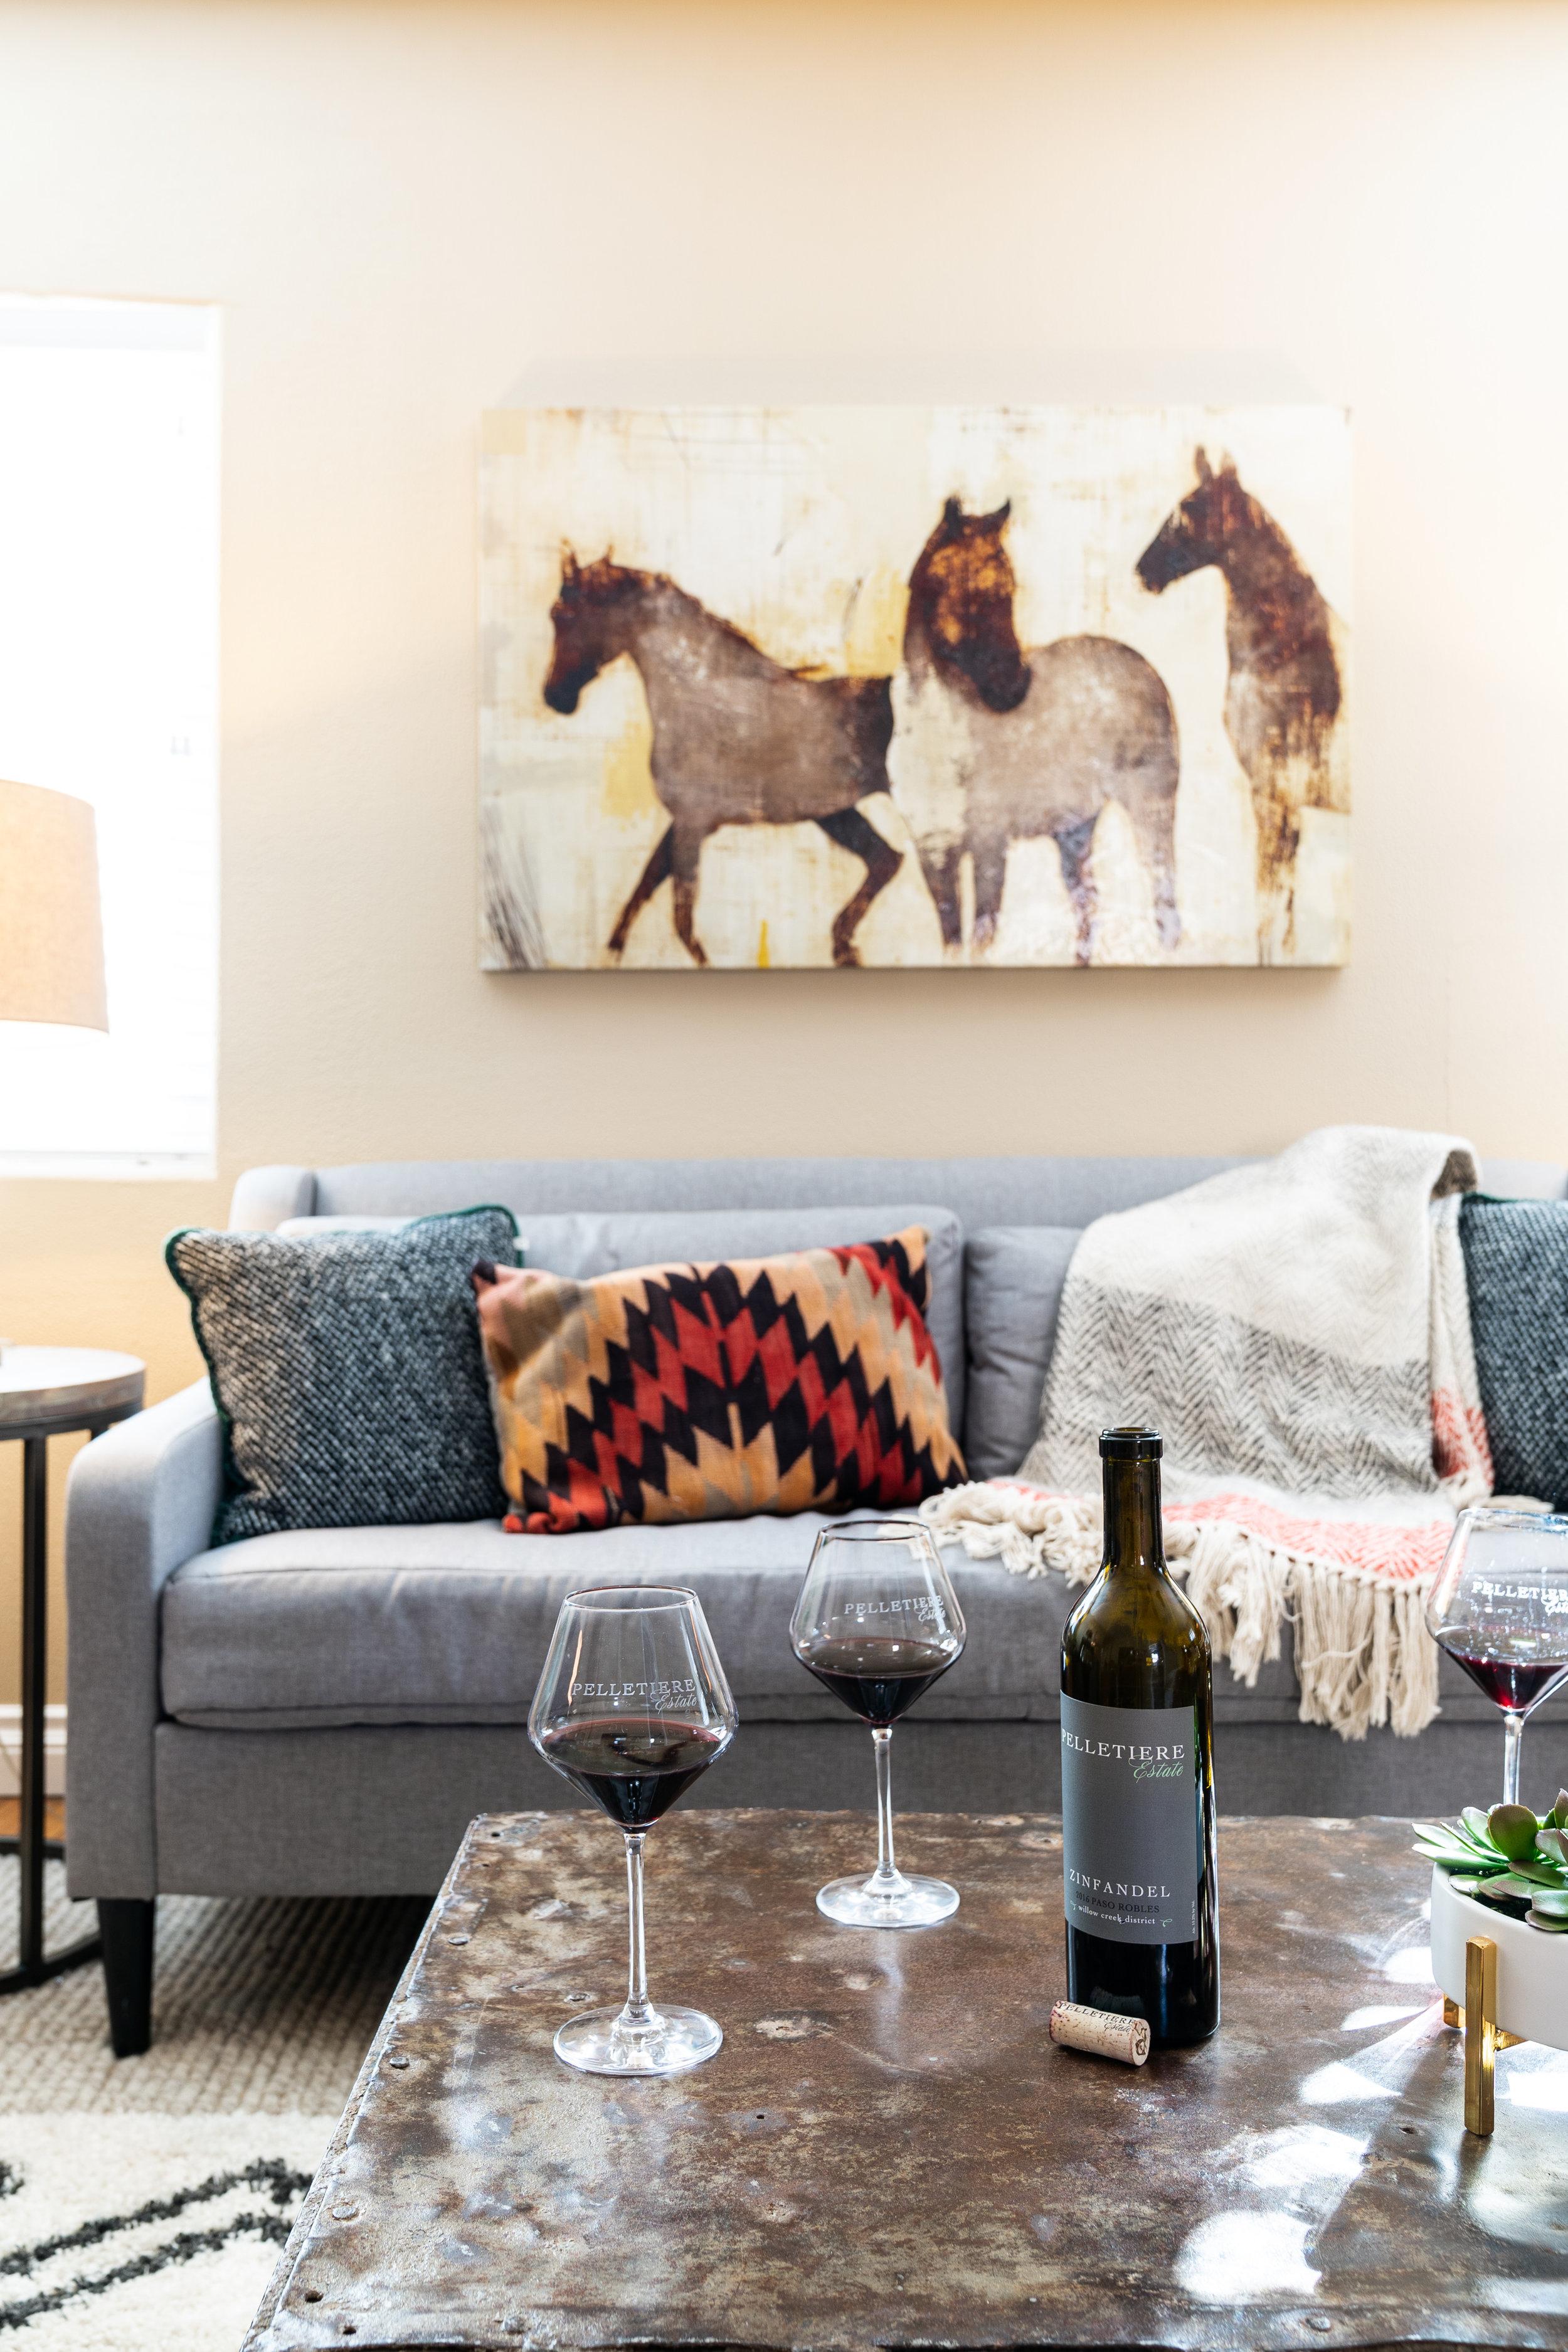 20181211_Airbnb01-2.jpg